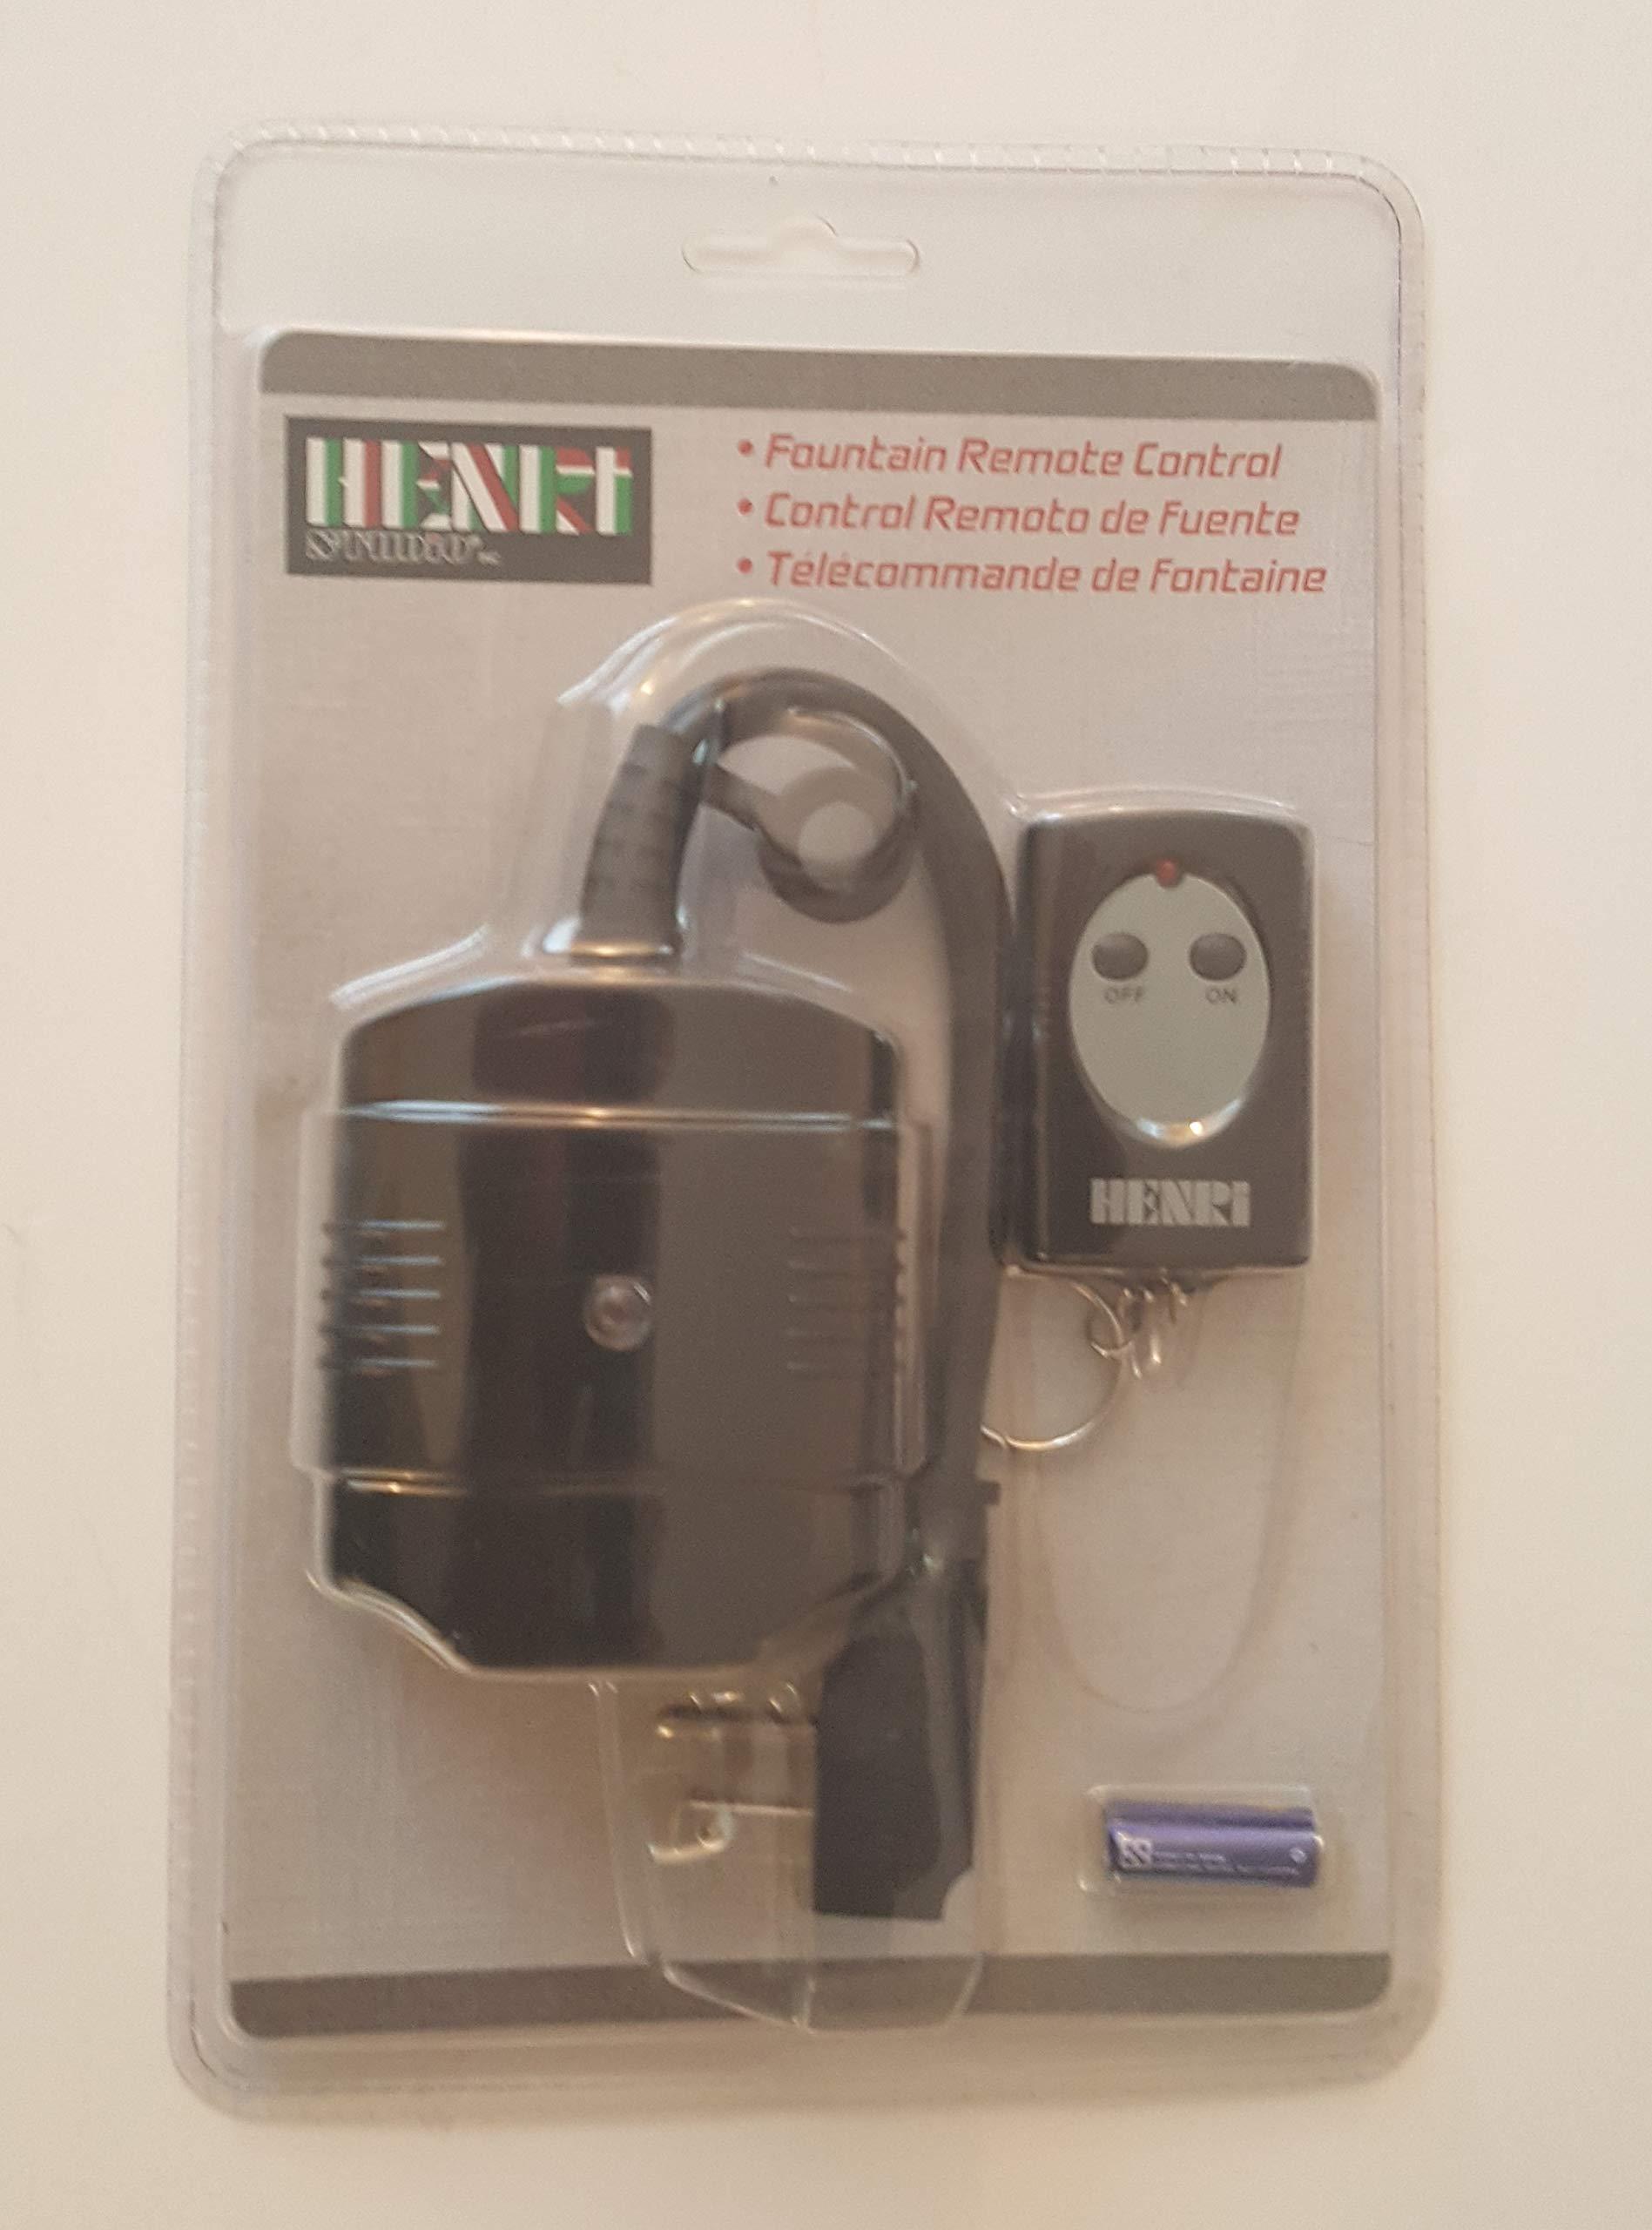 Fountain Remote Control, FOUNTAIN REMOTE CONTROL by Henri Studio